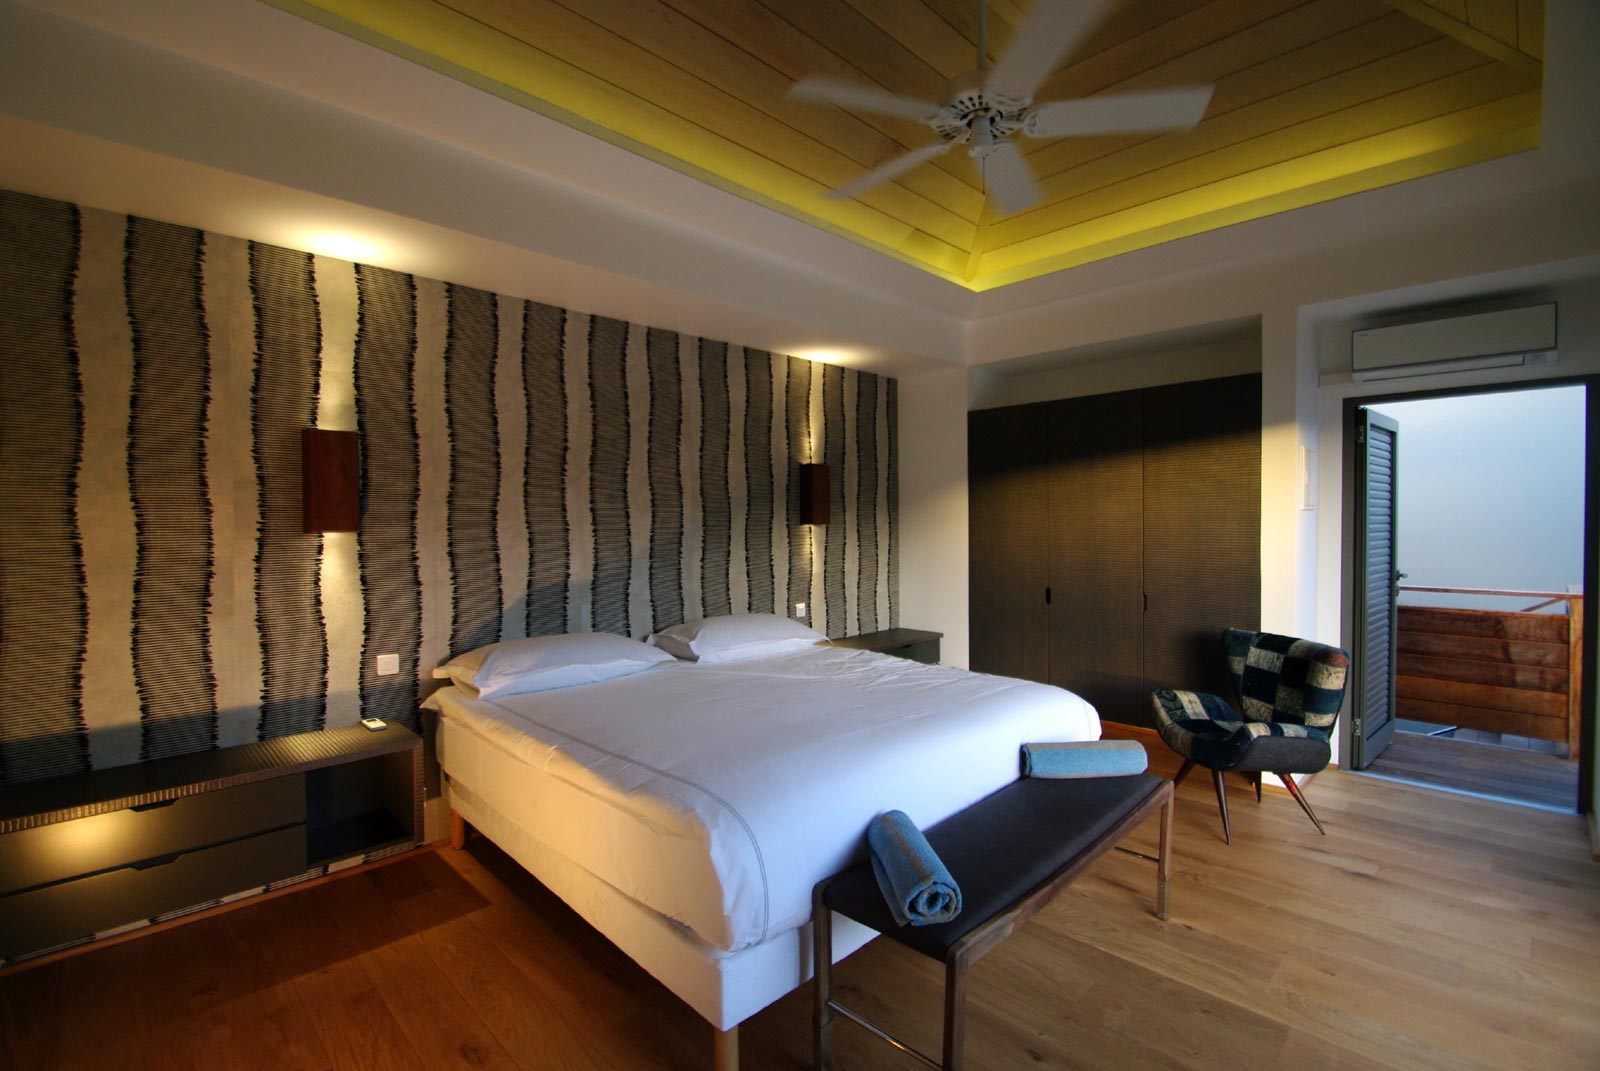 A spacious, modern bedroom at Lagon Vert, Petit Cul de Sac, St. Barths luxury villa rentals.